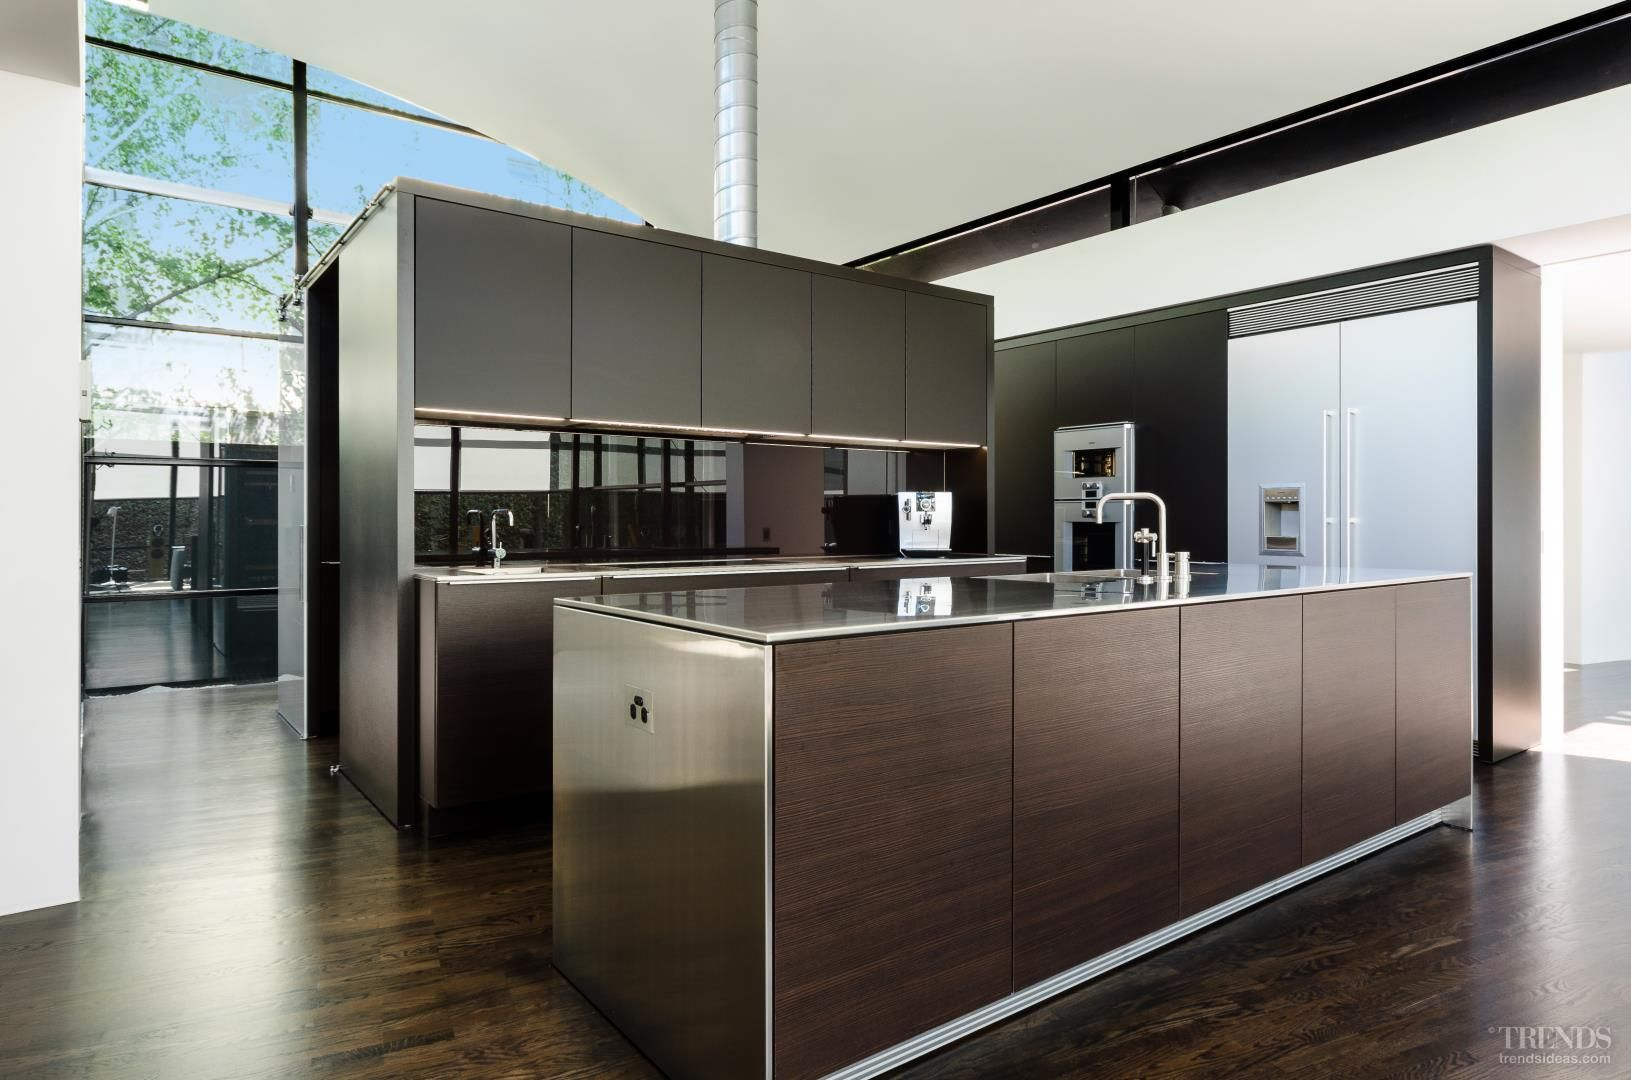 Contemporary Kitchen Insert Includes Wine Fridges And Concealed Butler S Pantry Tida Australian Im Scandinavian Kitchen Design Best Kitchen Designs Cabinetry